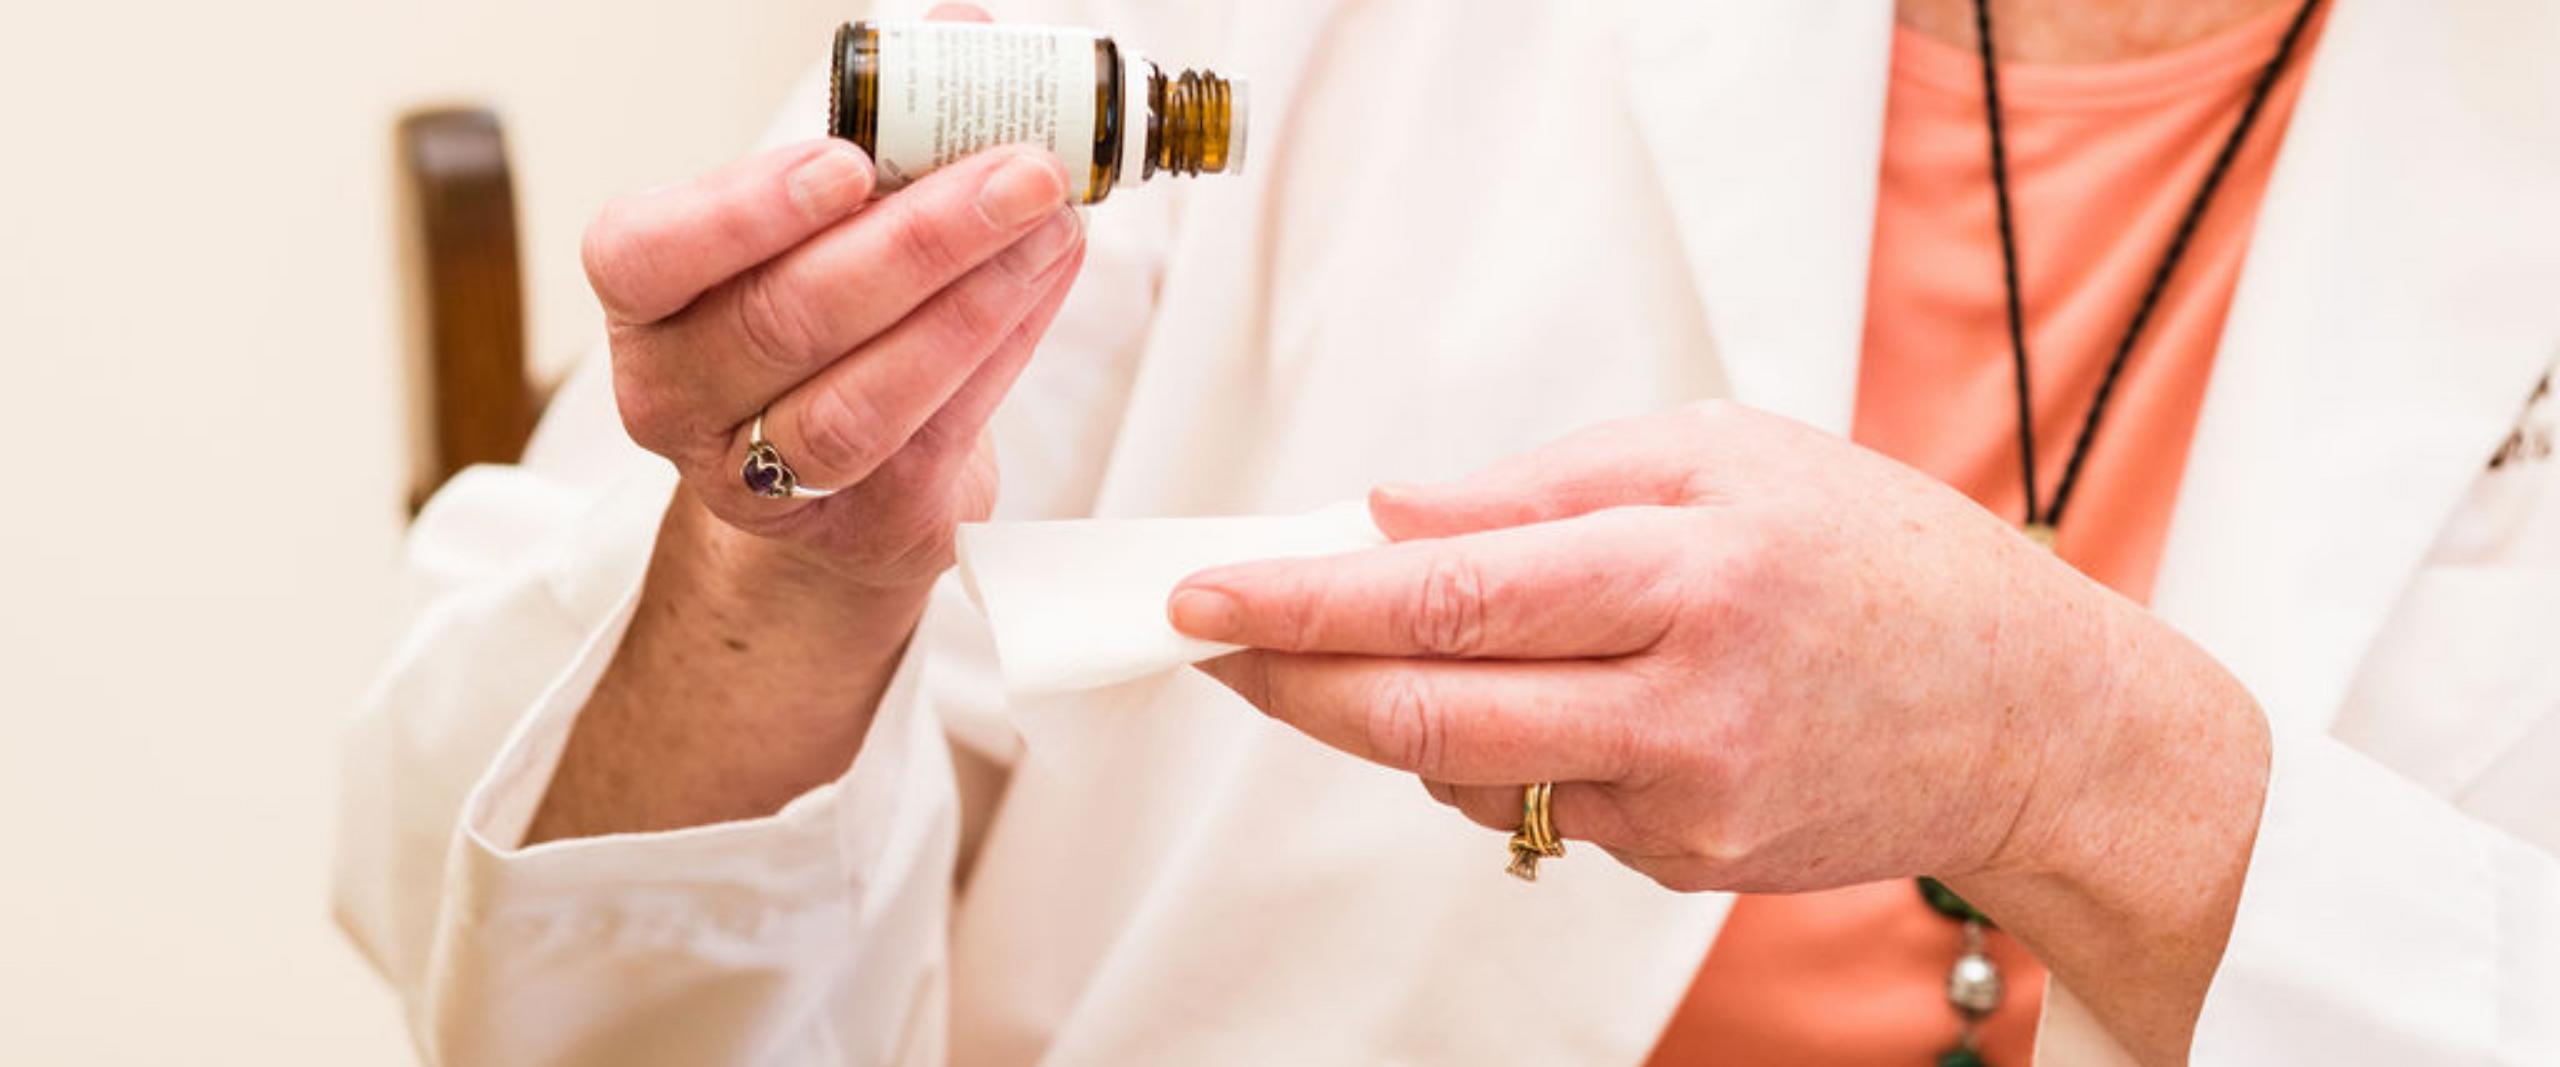 Debra Reis -  Aromatherapy for Healthy Living